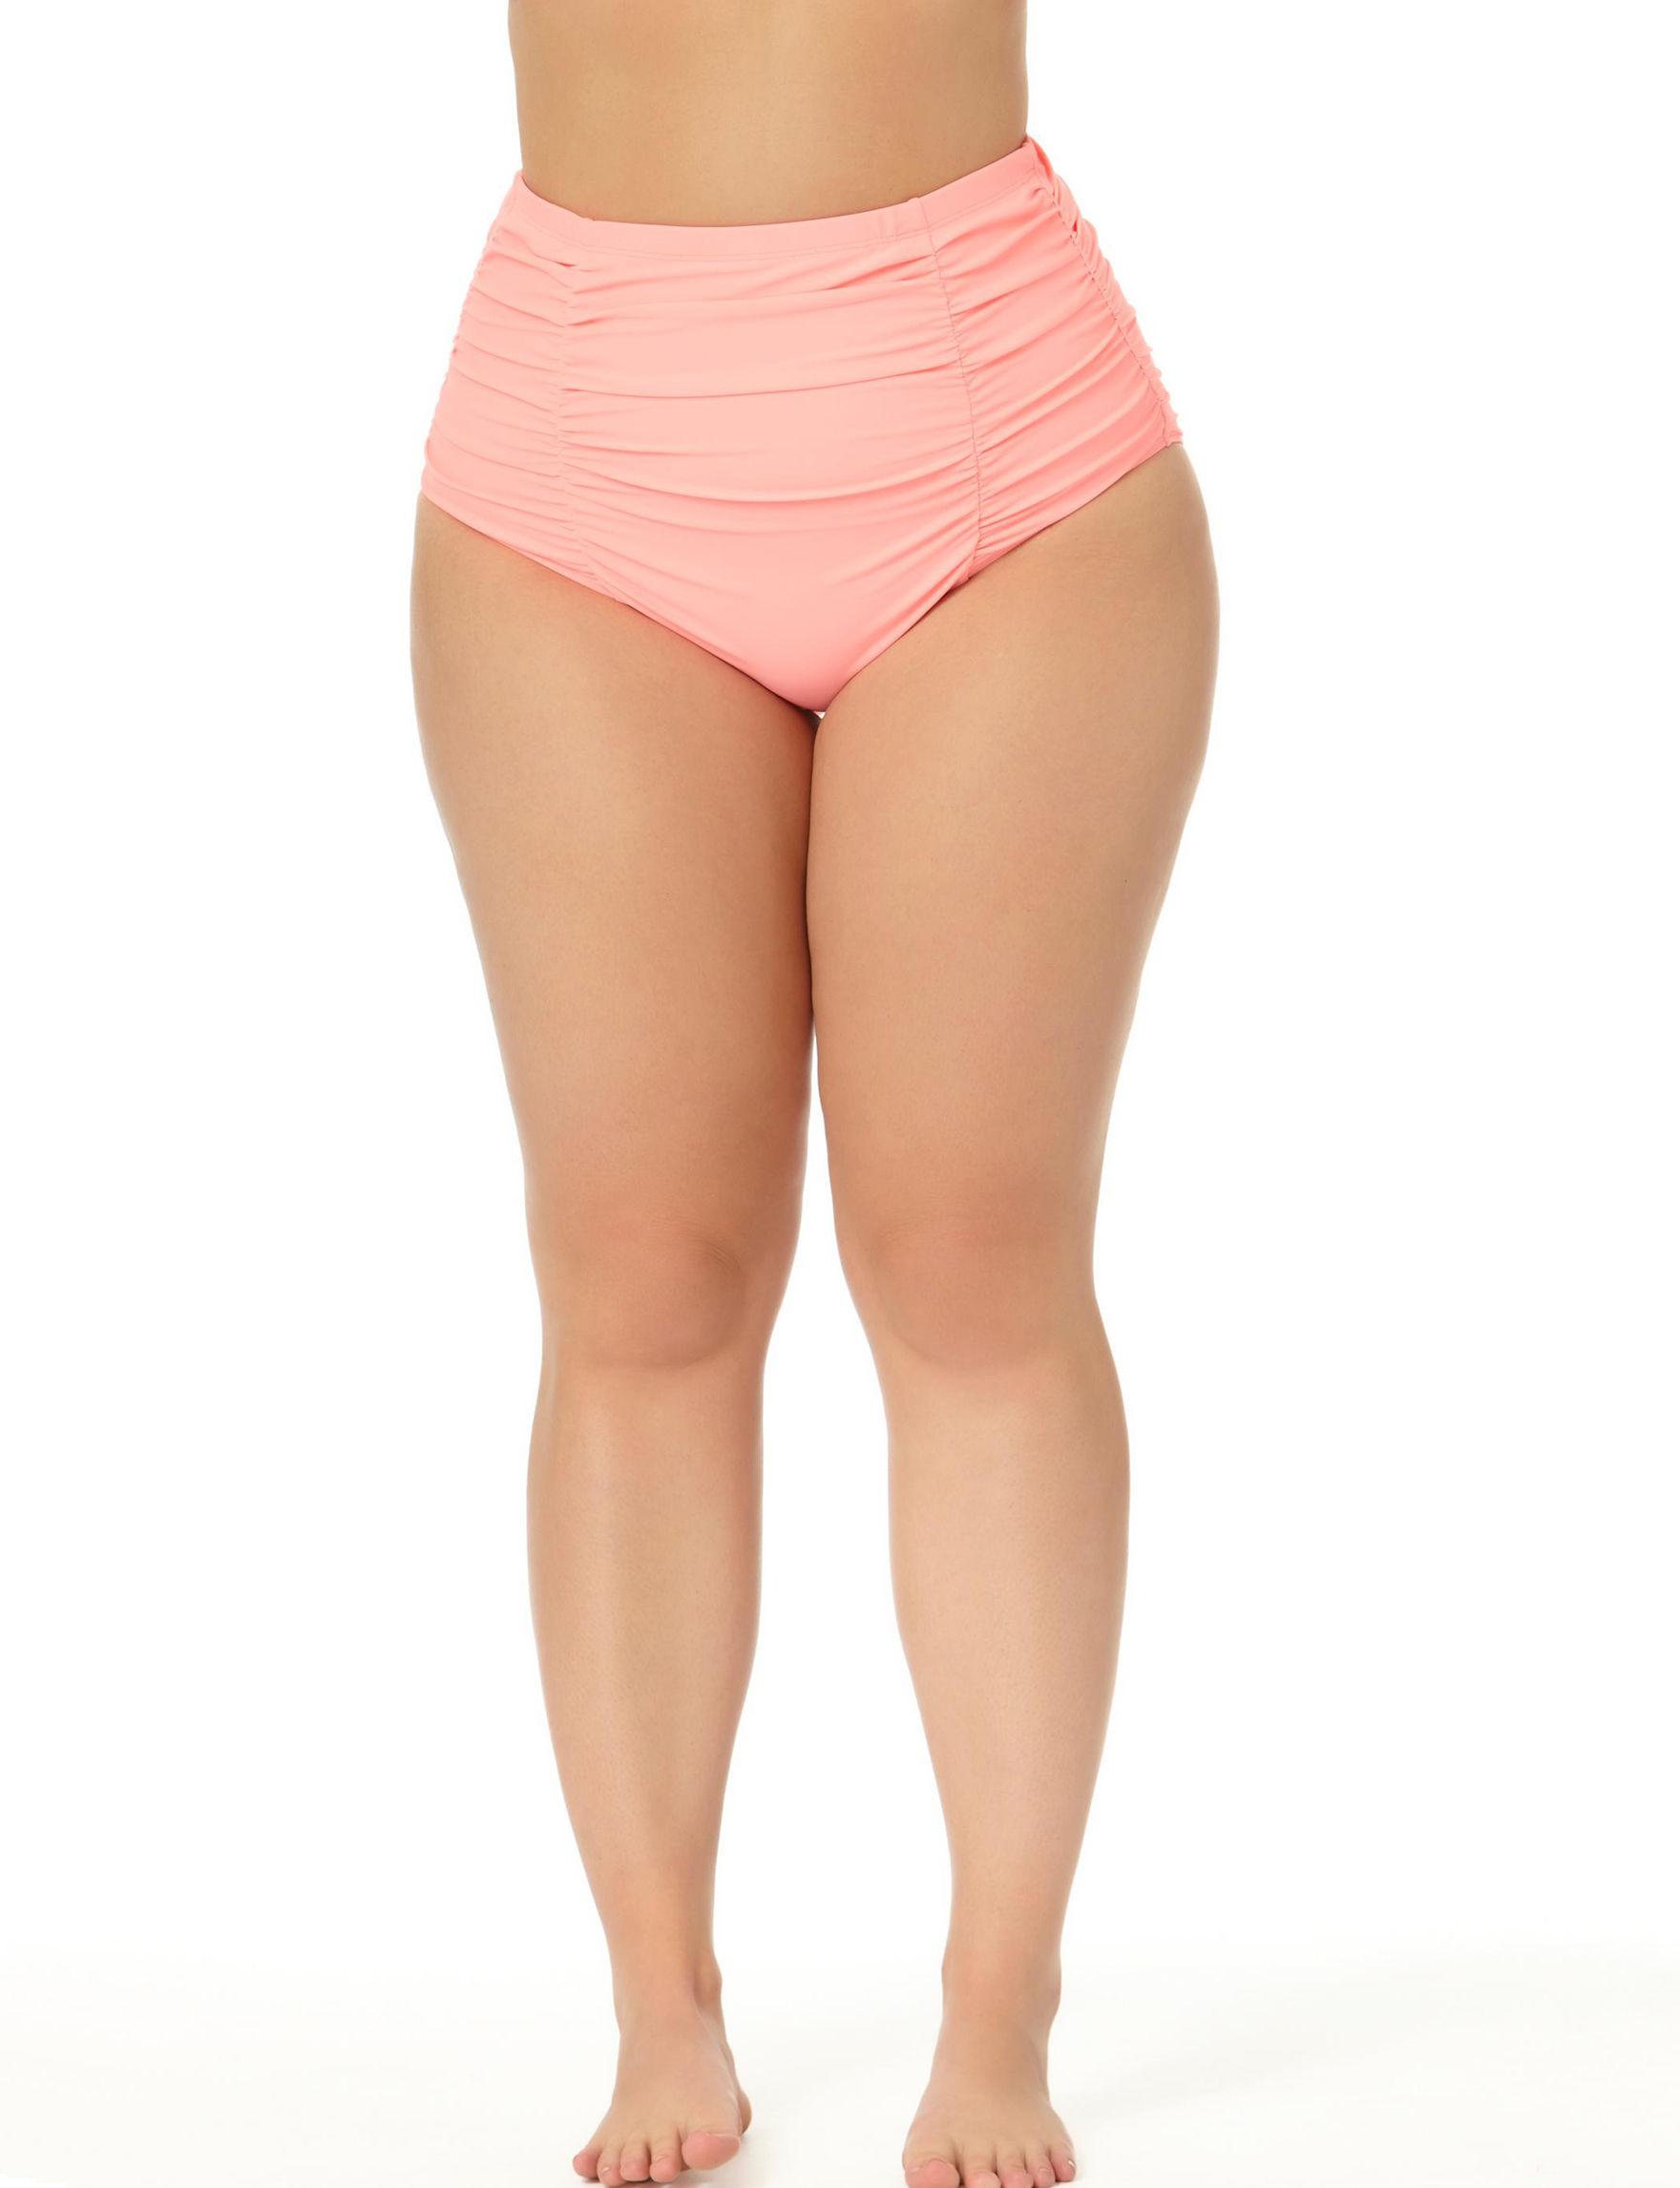 Allure Light Orange Swimsuit Bottoms High Waist